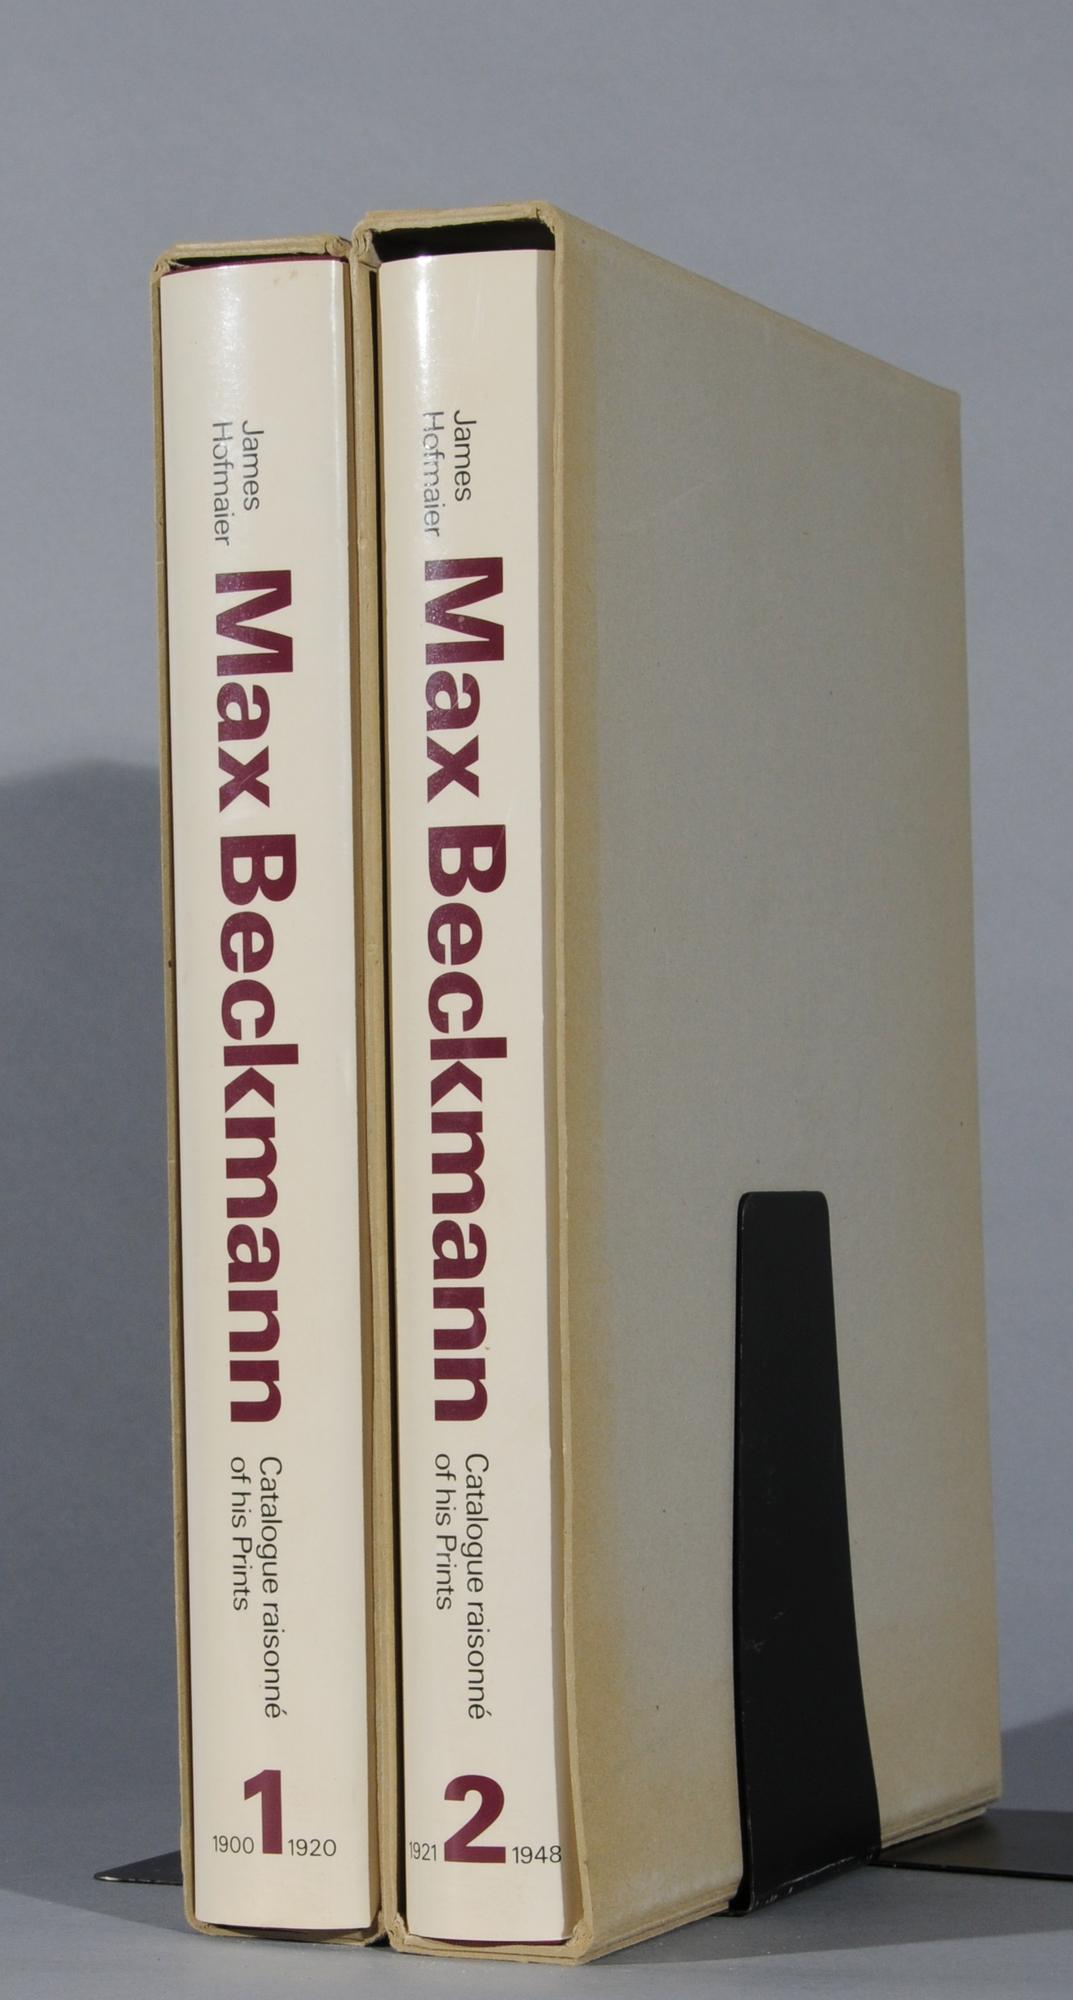 Beckmann Max, Catalogue Raisonné: James Hofmaier. Max Beckmann, Catalogue Raisonné of His Prints, Vol. 1 and 2